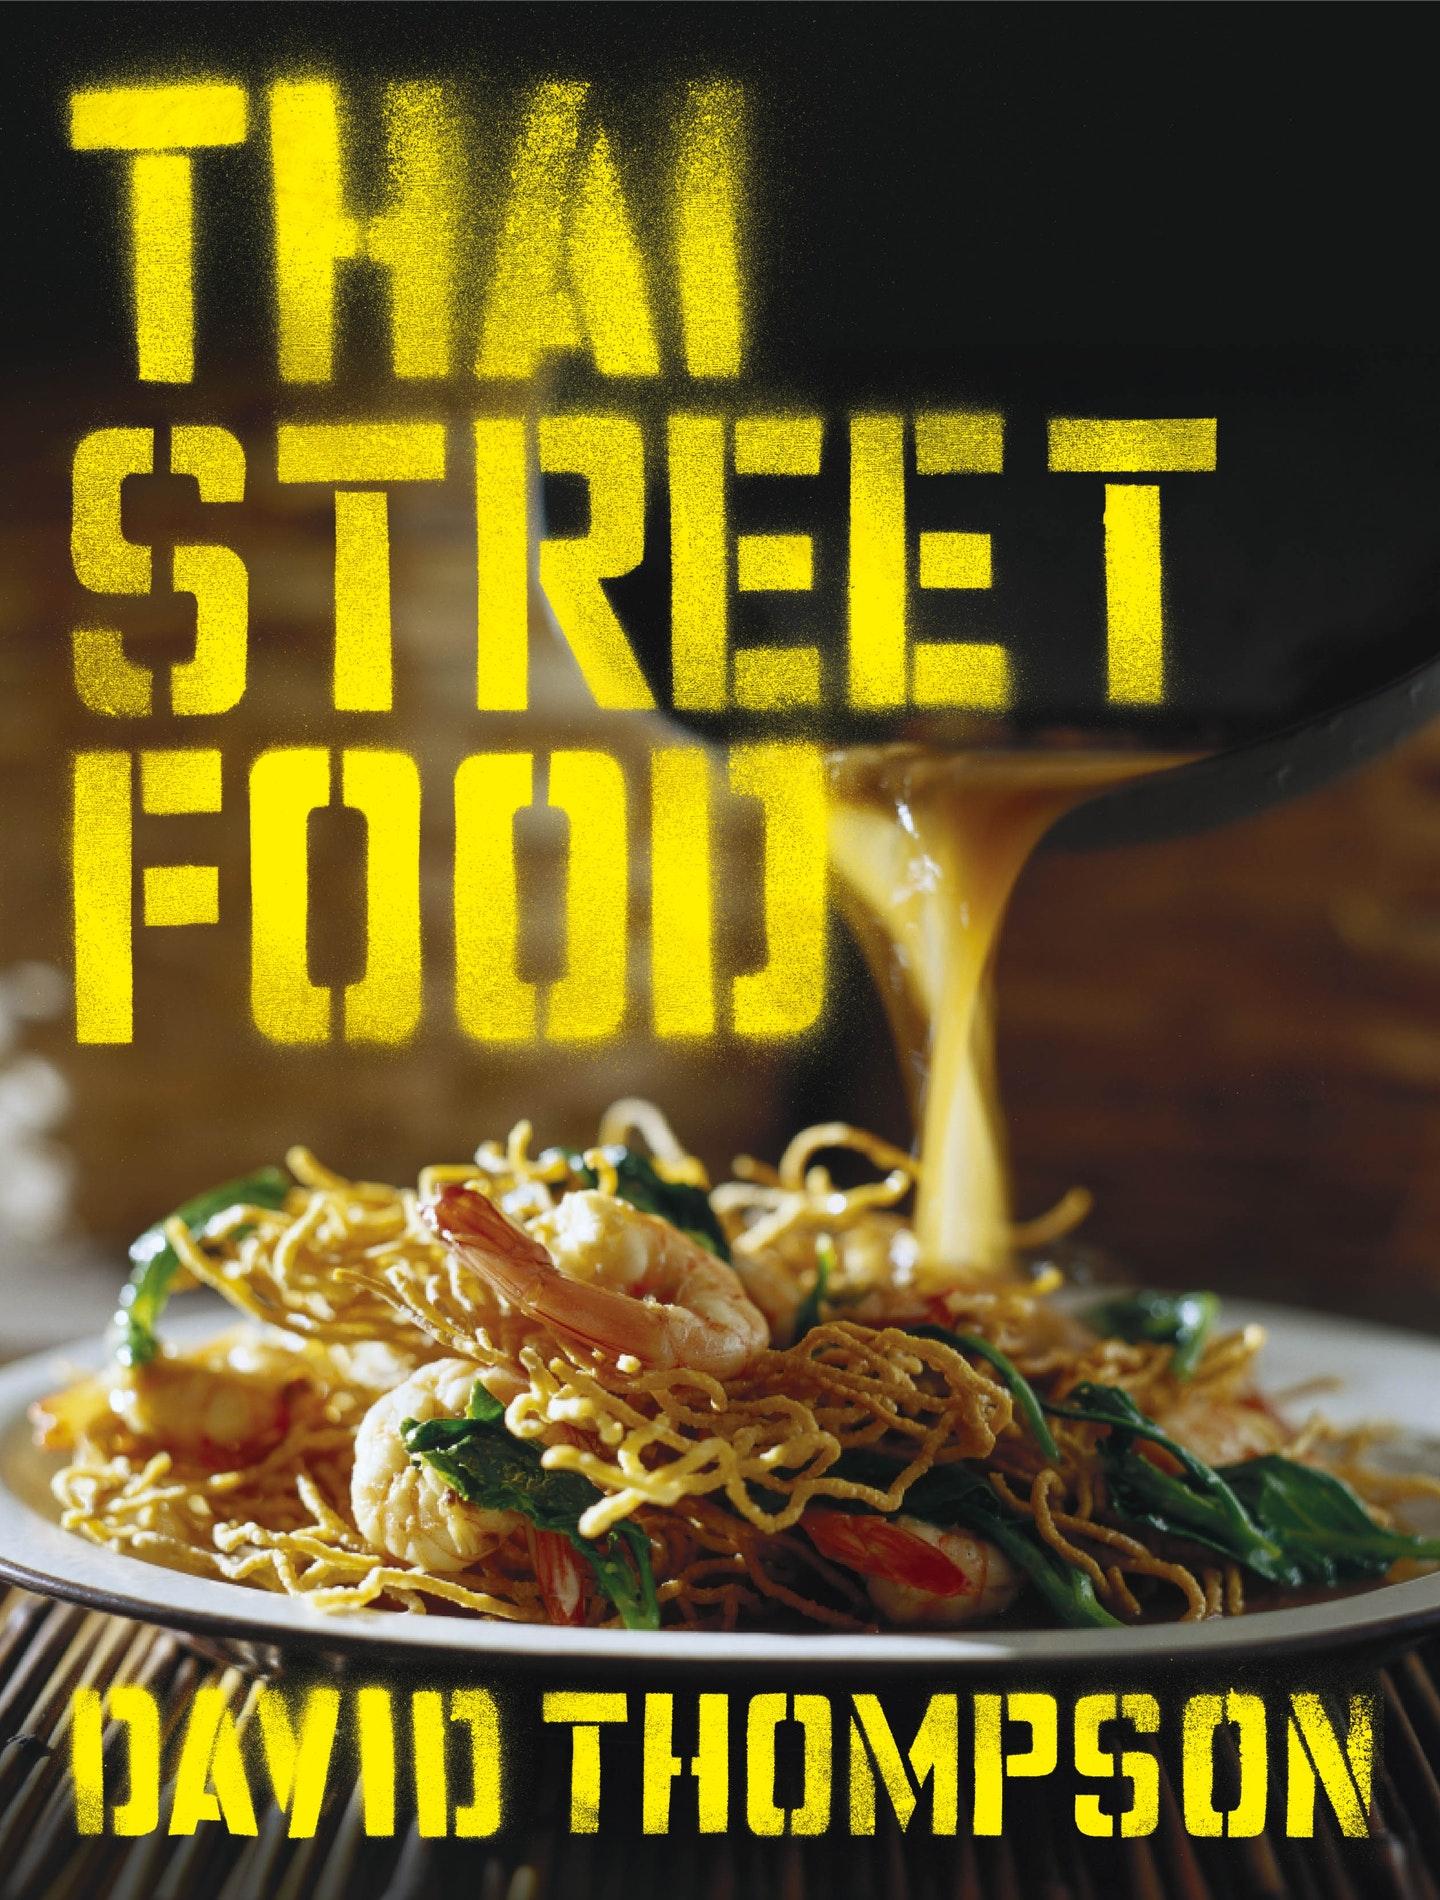 Fast Food Nation Book Cover : Thai street food penguin books australia